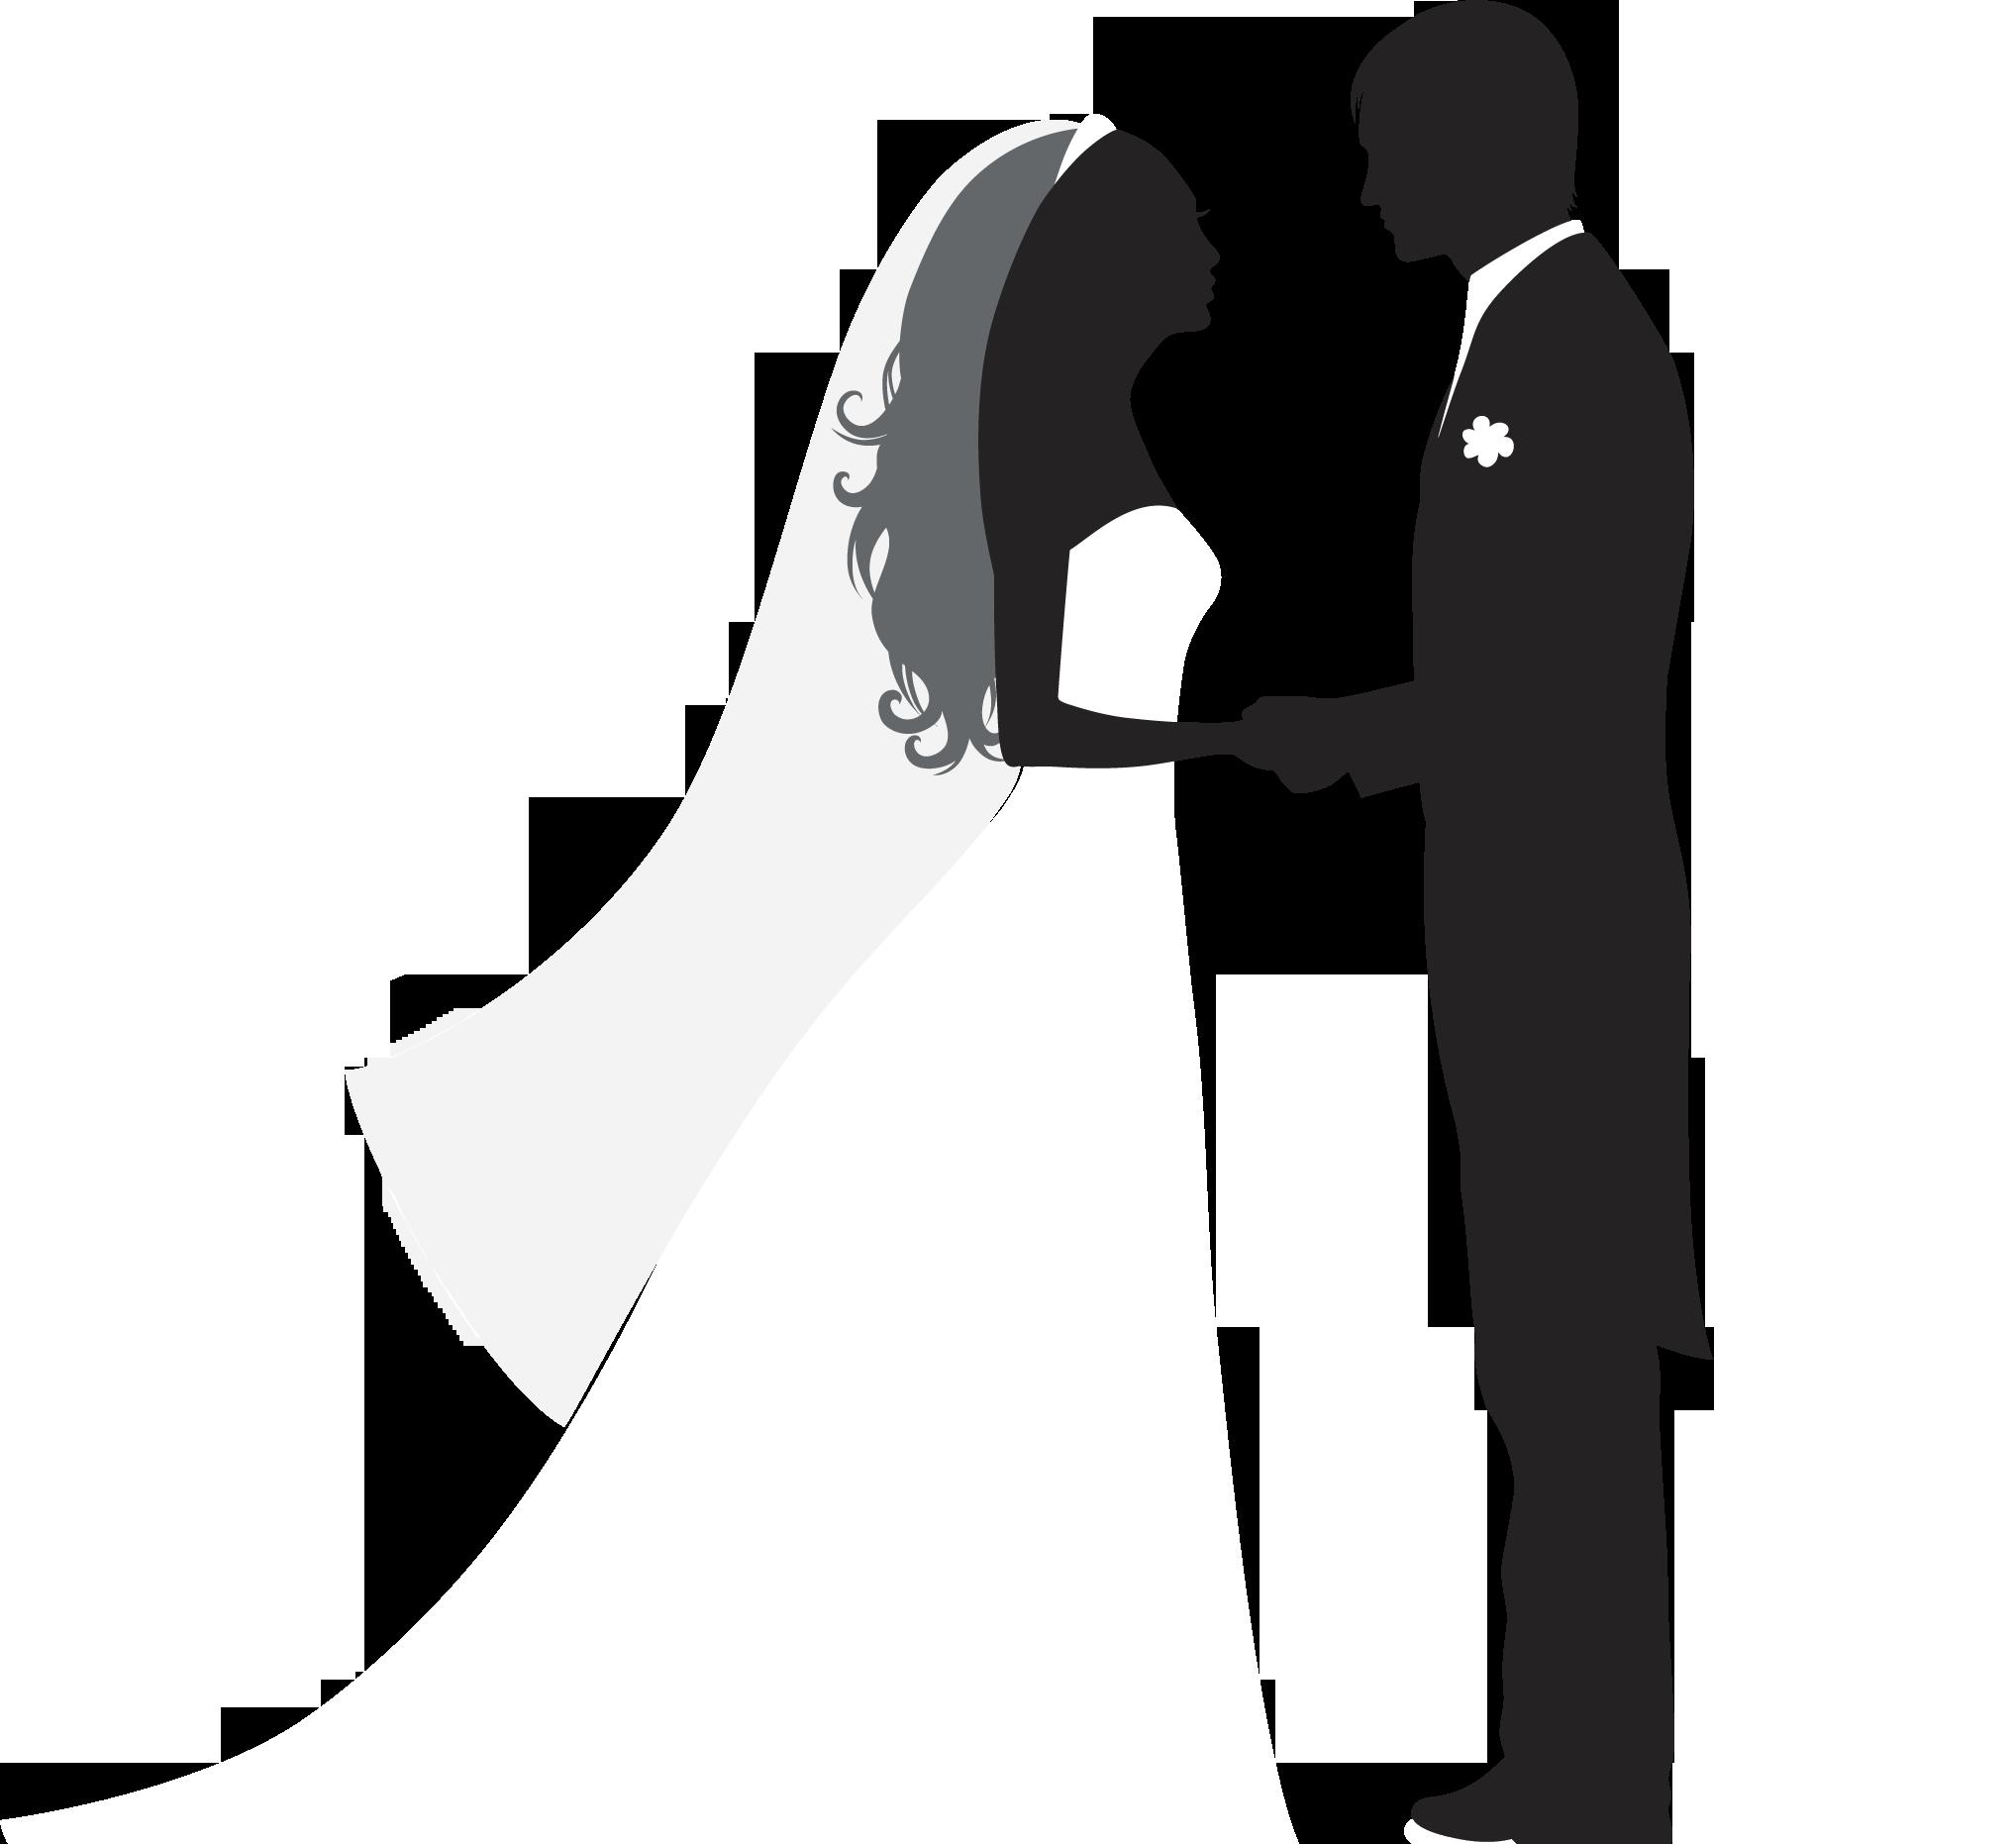 أروع أزواج العروس تشكيلة سكرابز ظلال عرسان لقسم Wedding Silhouette Human Silhouette Silhouette